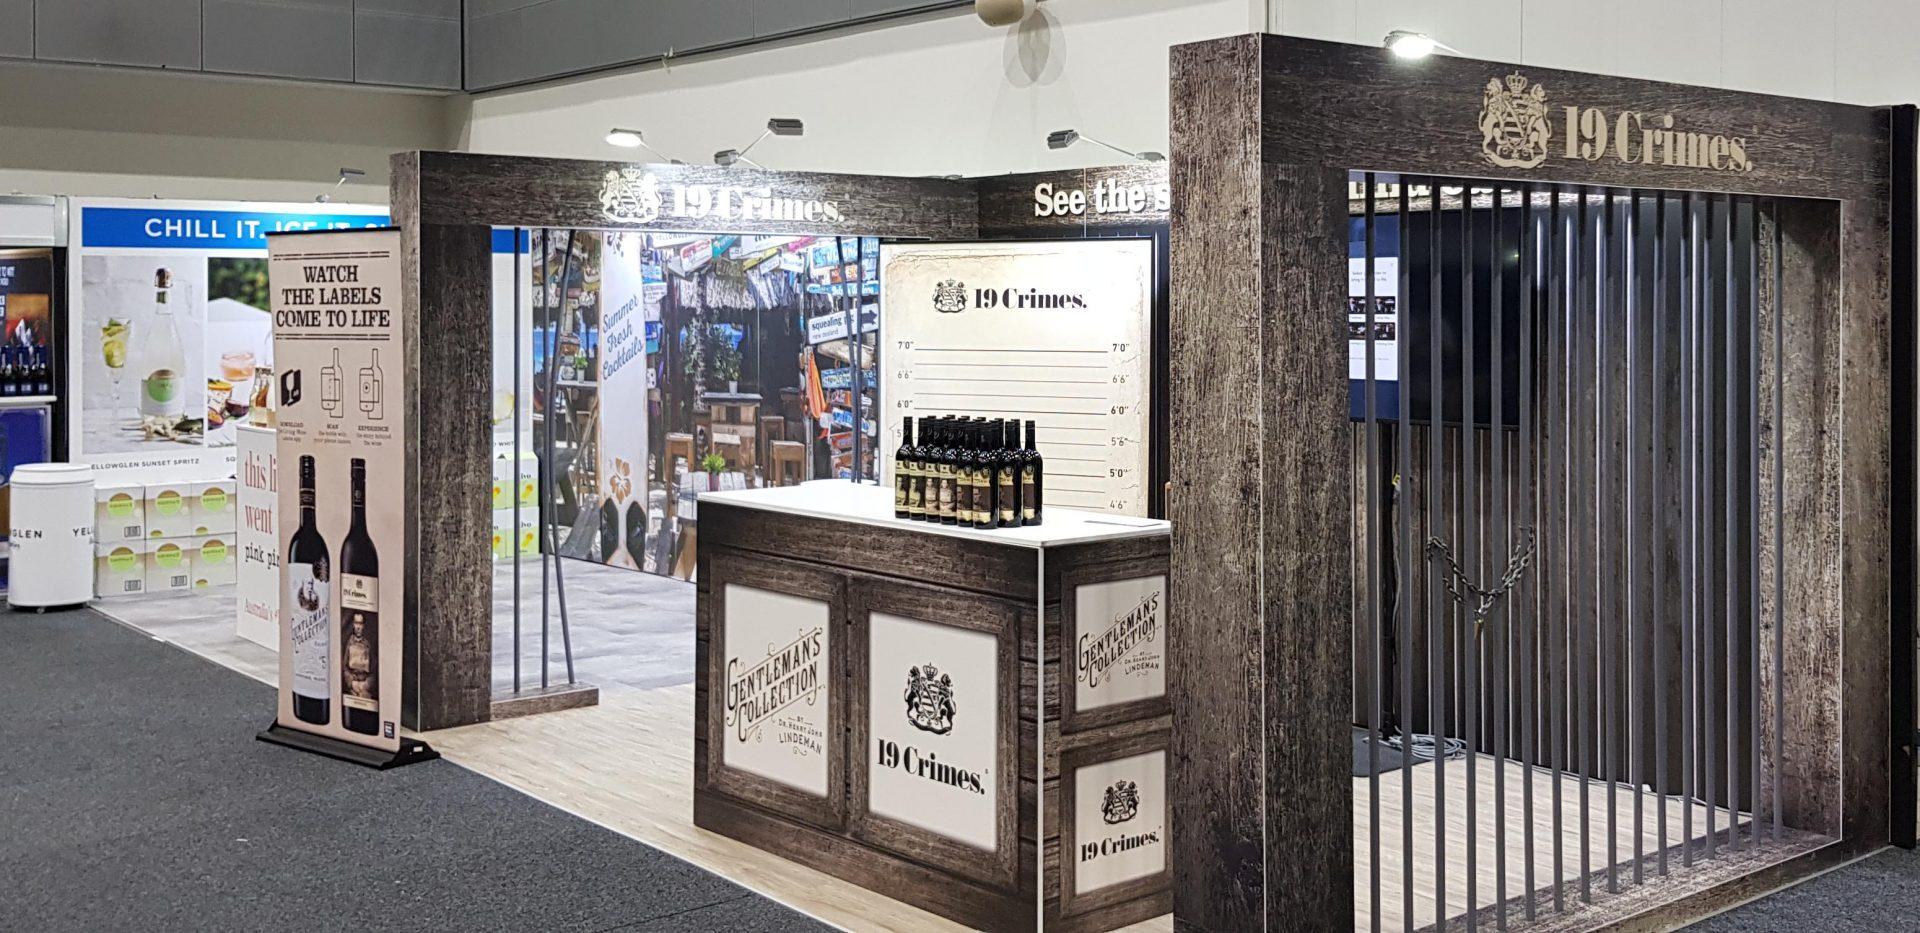 19 Crimes Coles Liquor Store Managers Showcase Gold Coast